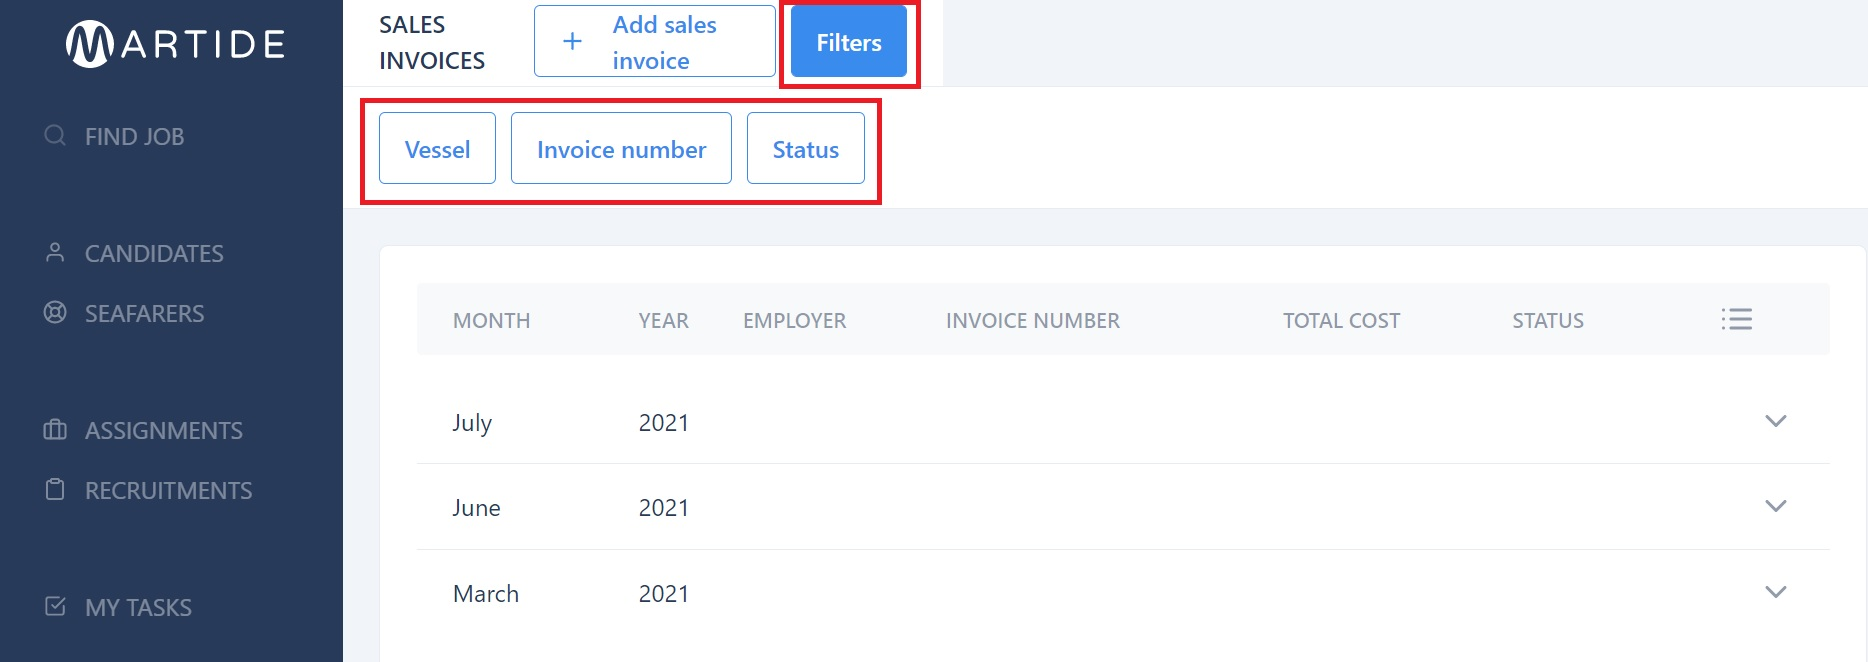 screenshot showing the filter buttons